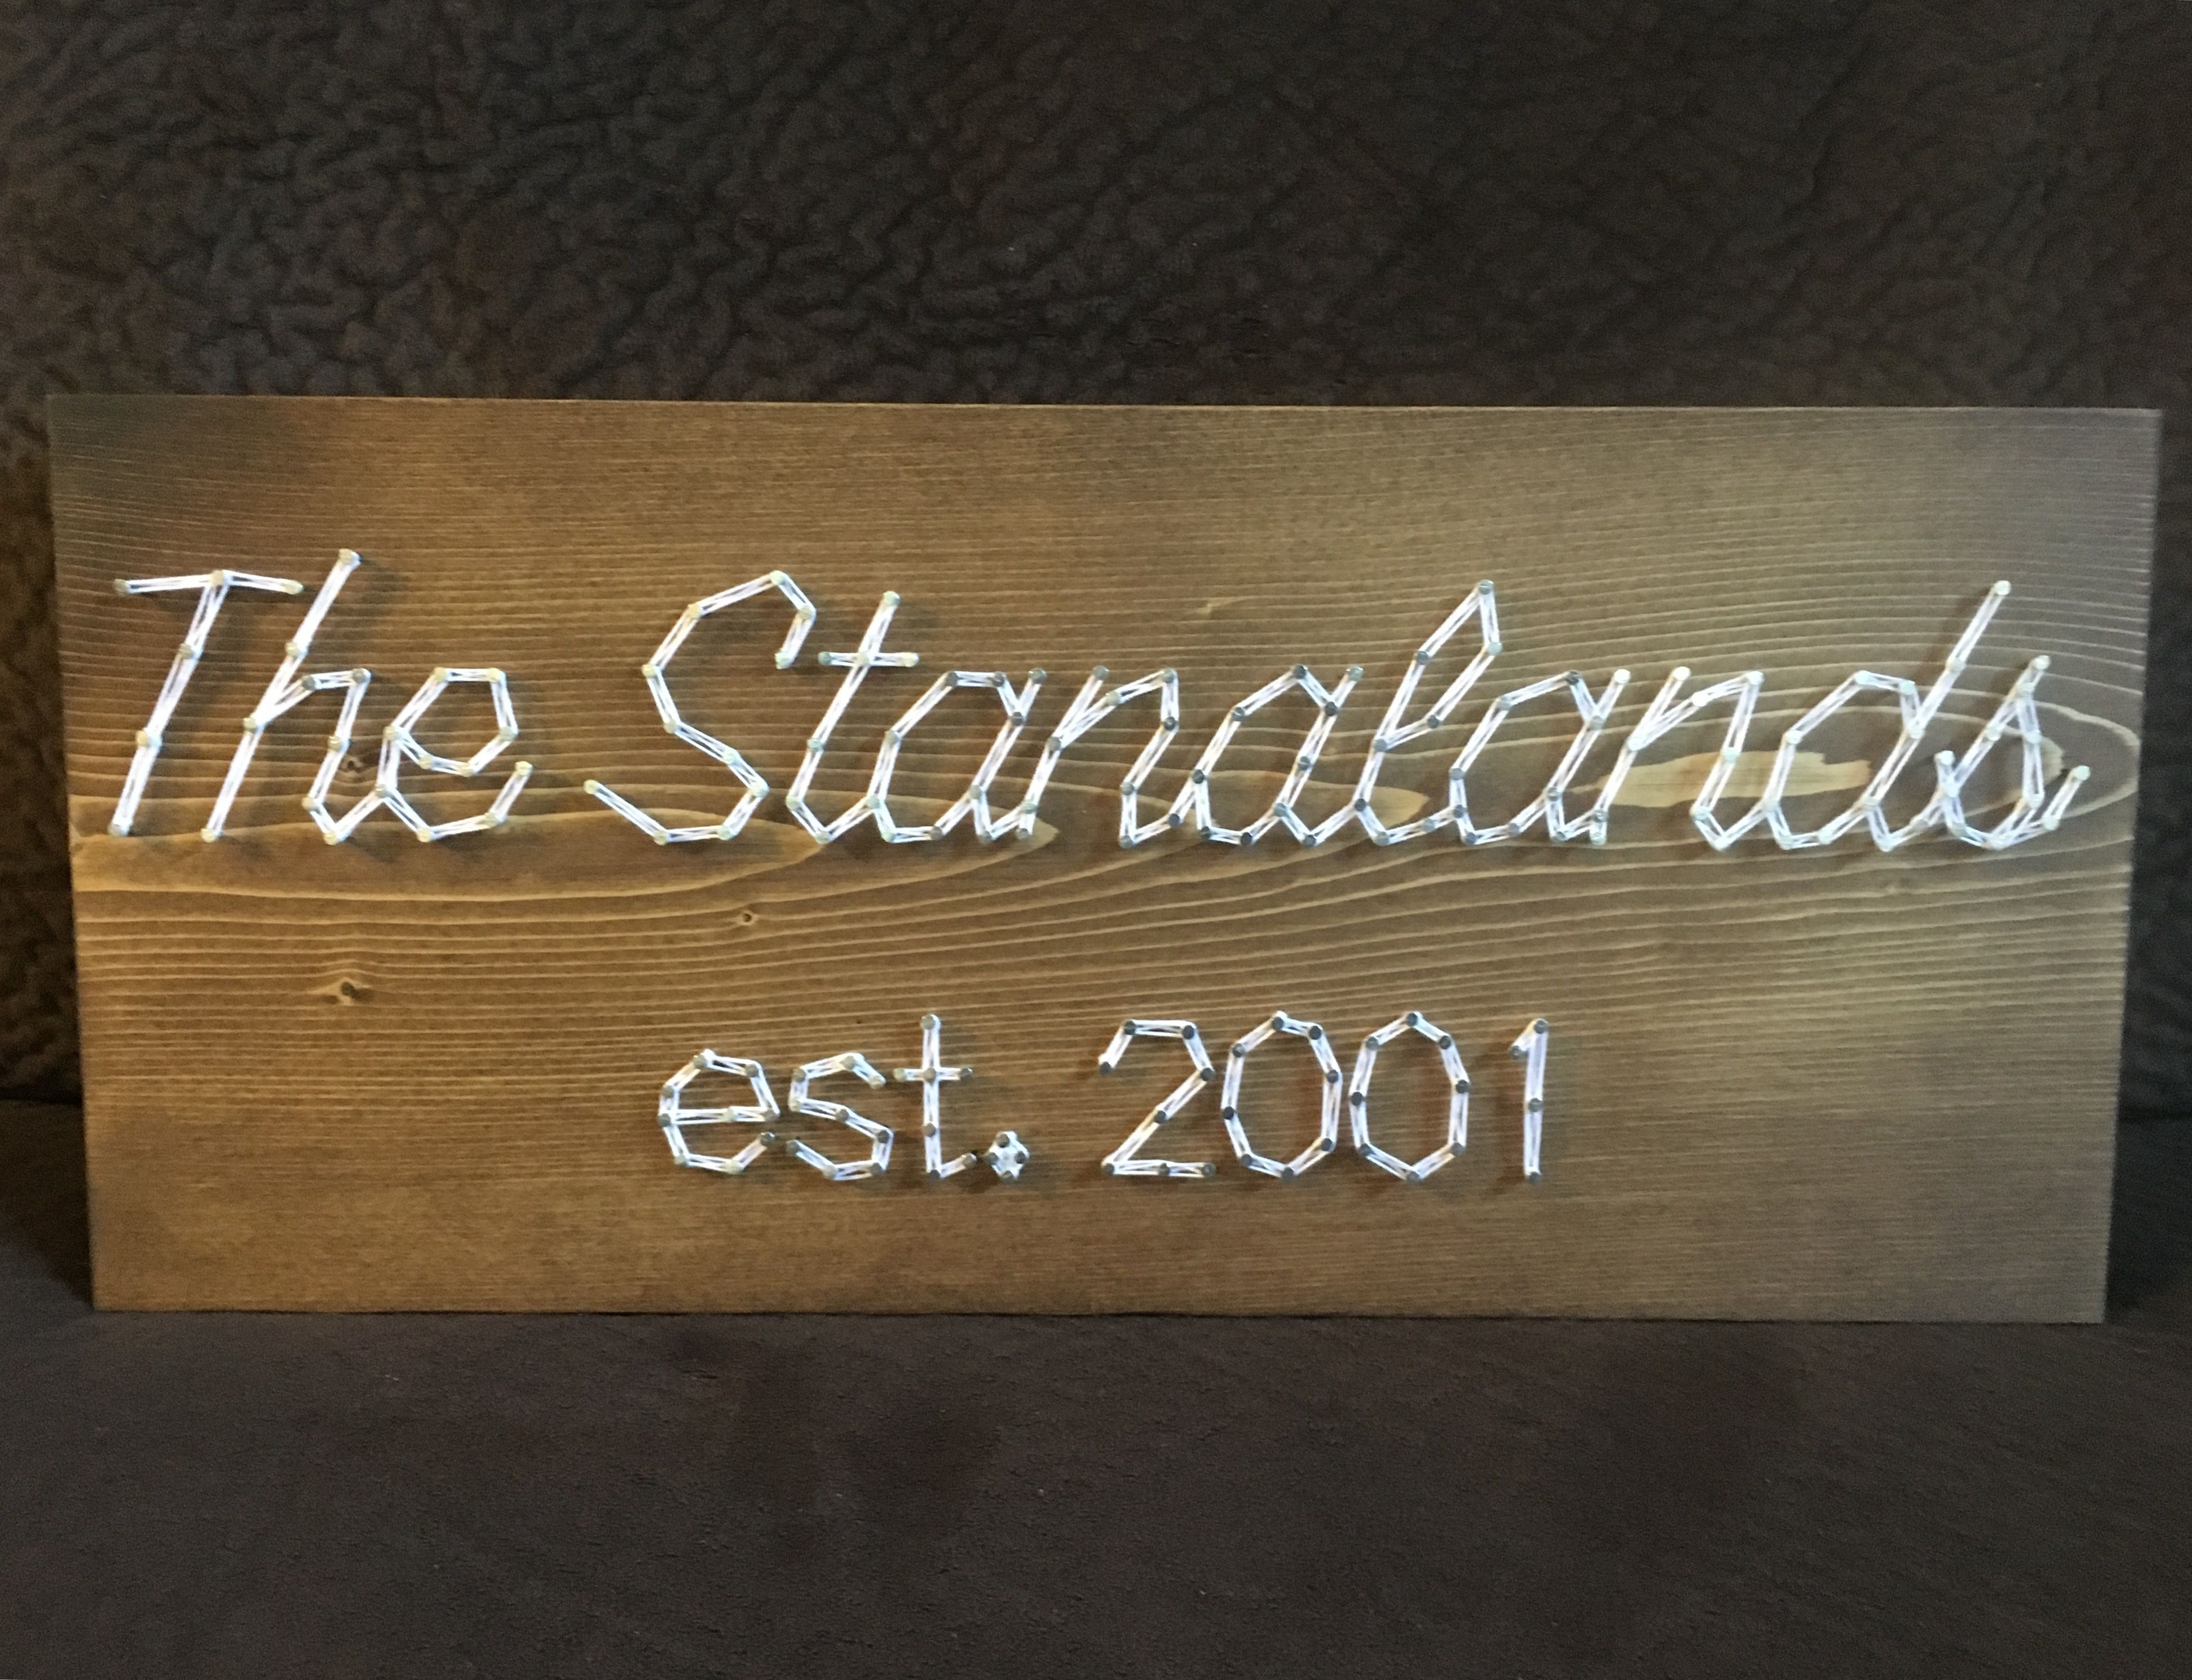 Custom wedding anniversary string art family name wedding date gift for fiance girlfriend boyfriend gift christmas present